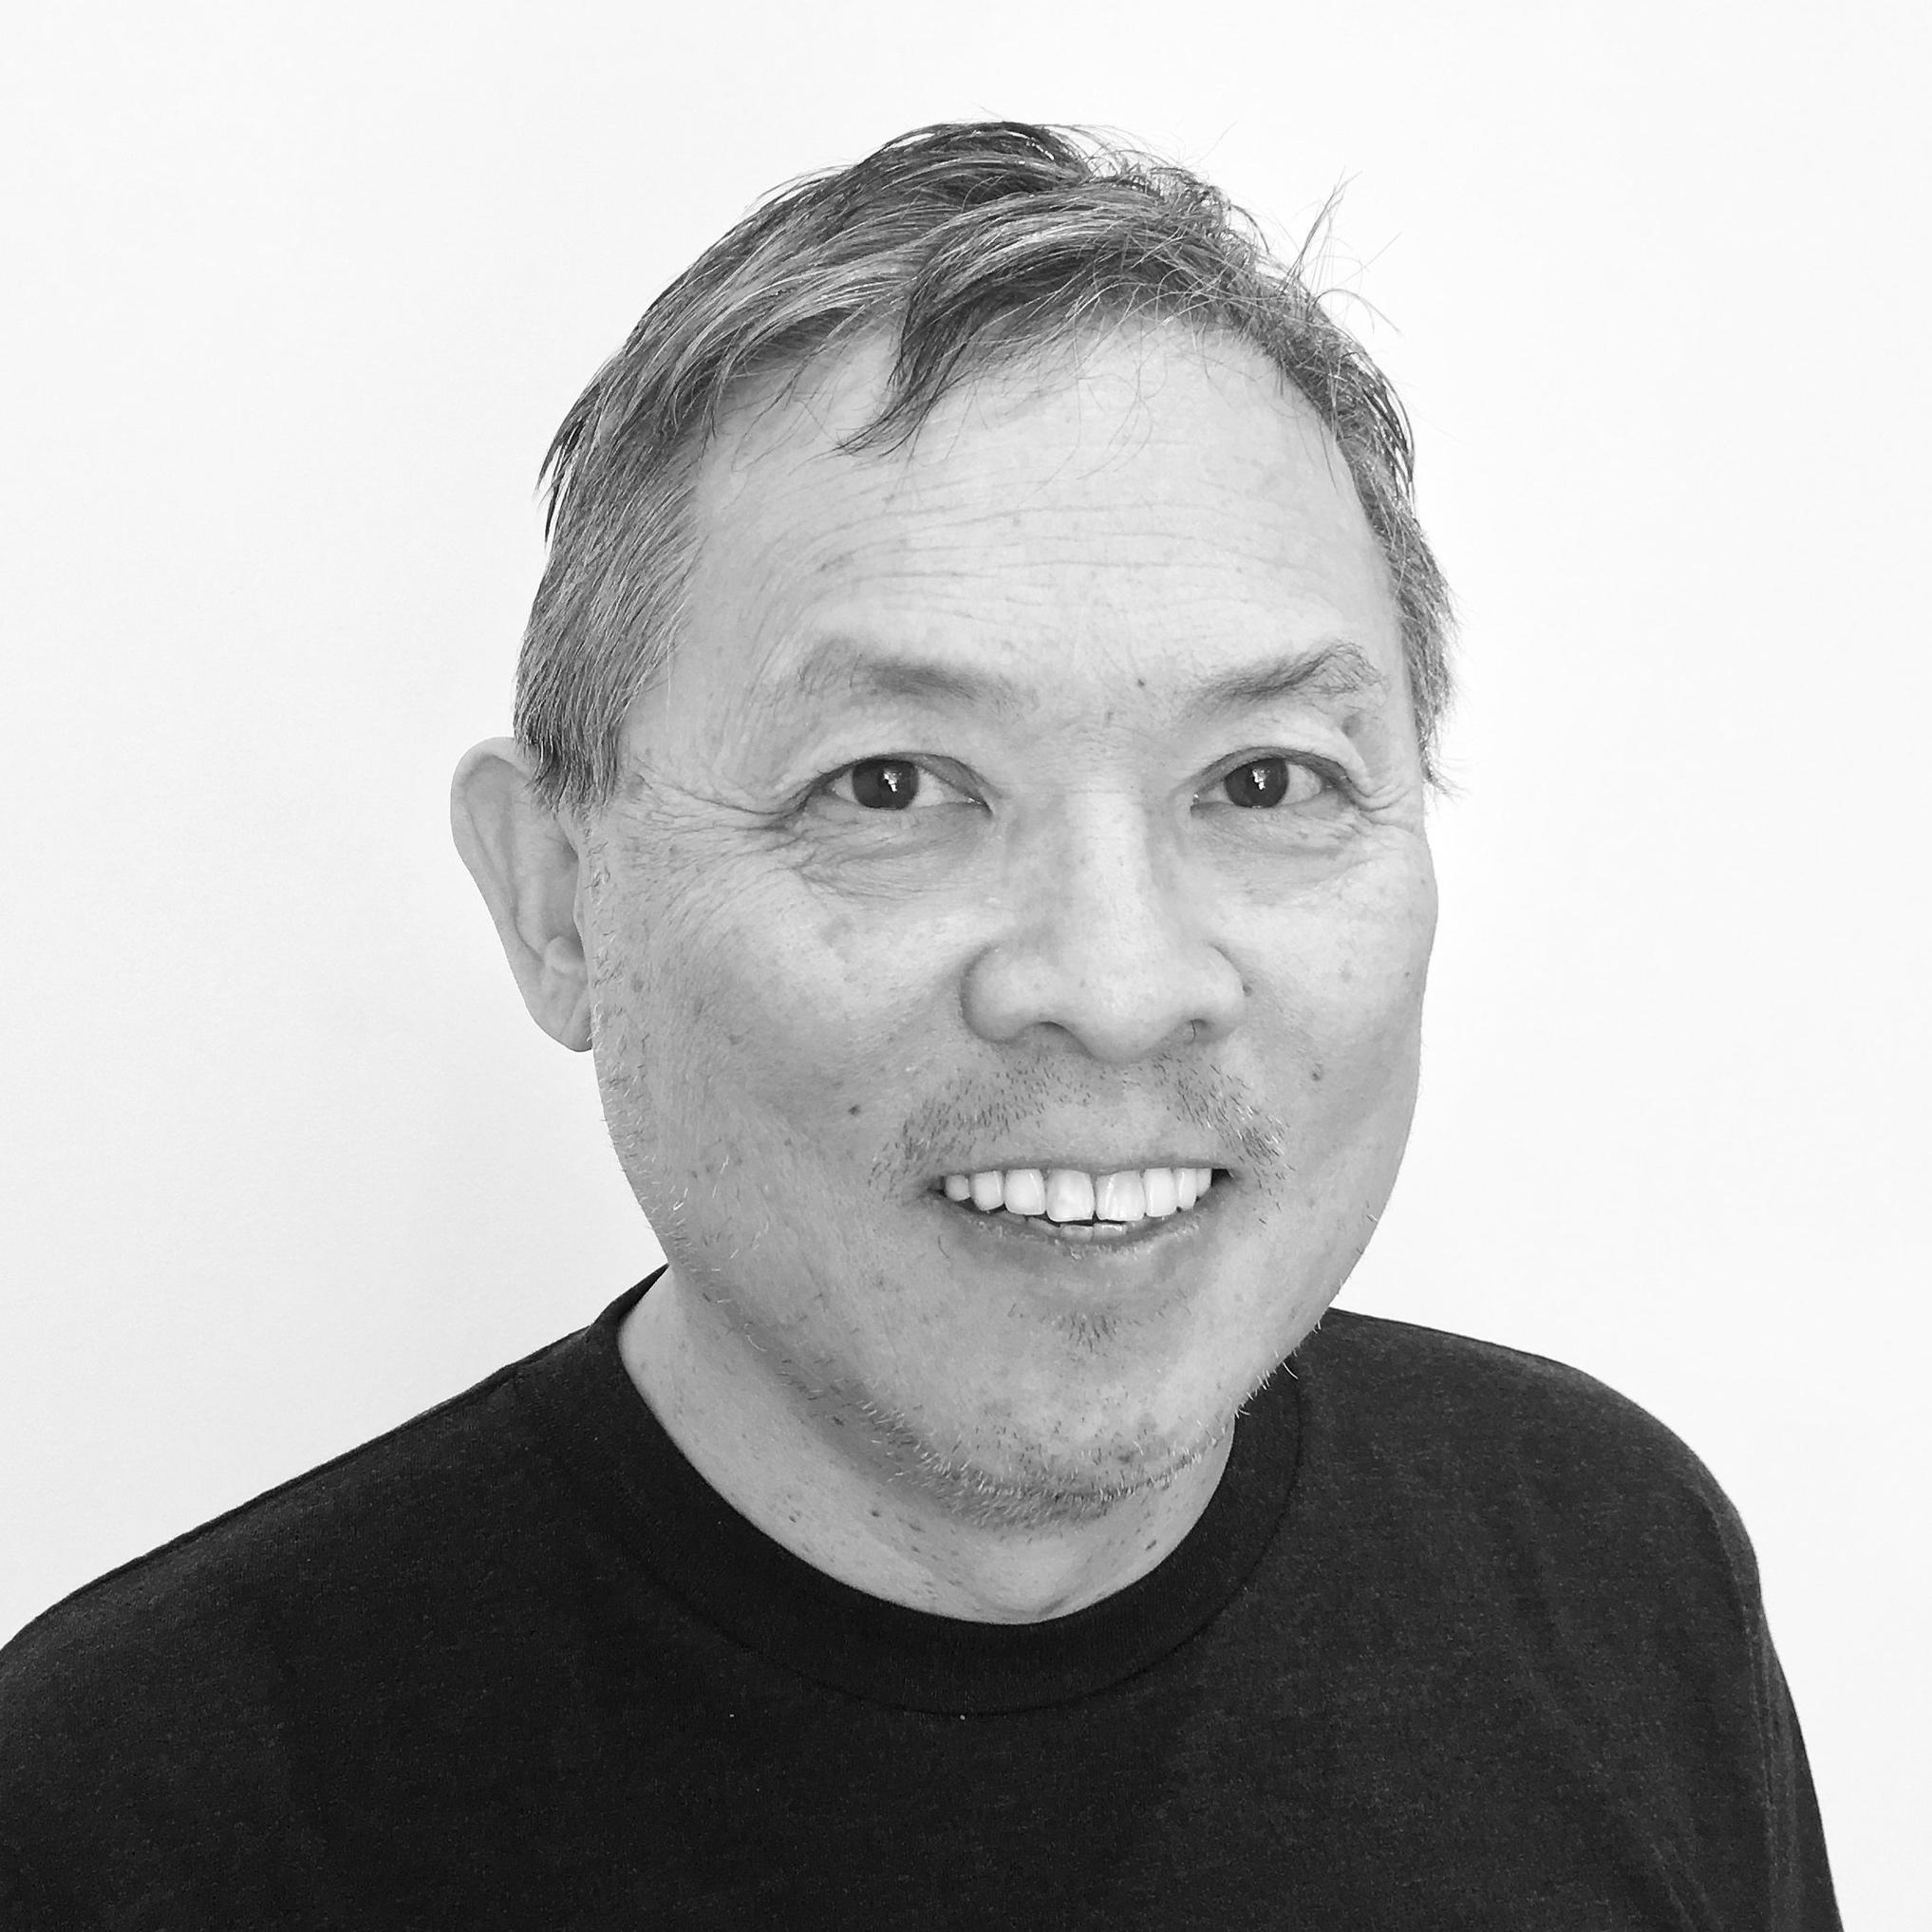 Randall+Wong_by+Mark+Abramson_IMG_2080.jpg